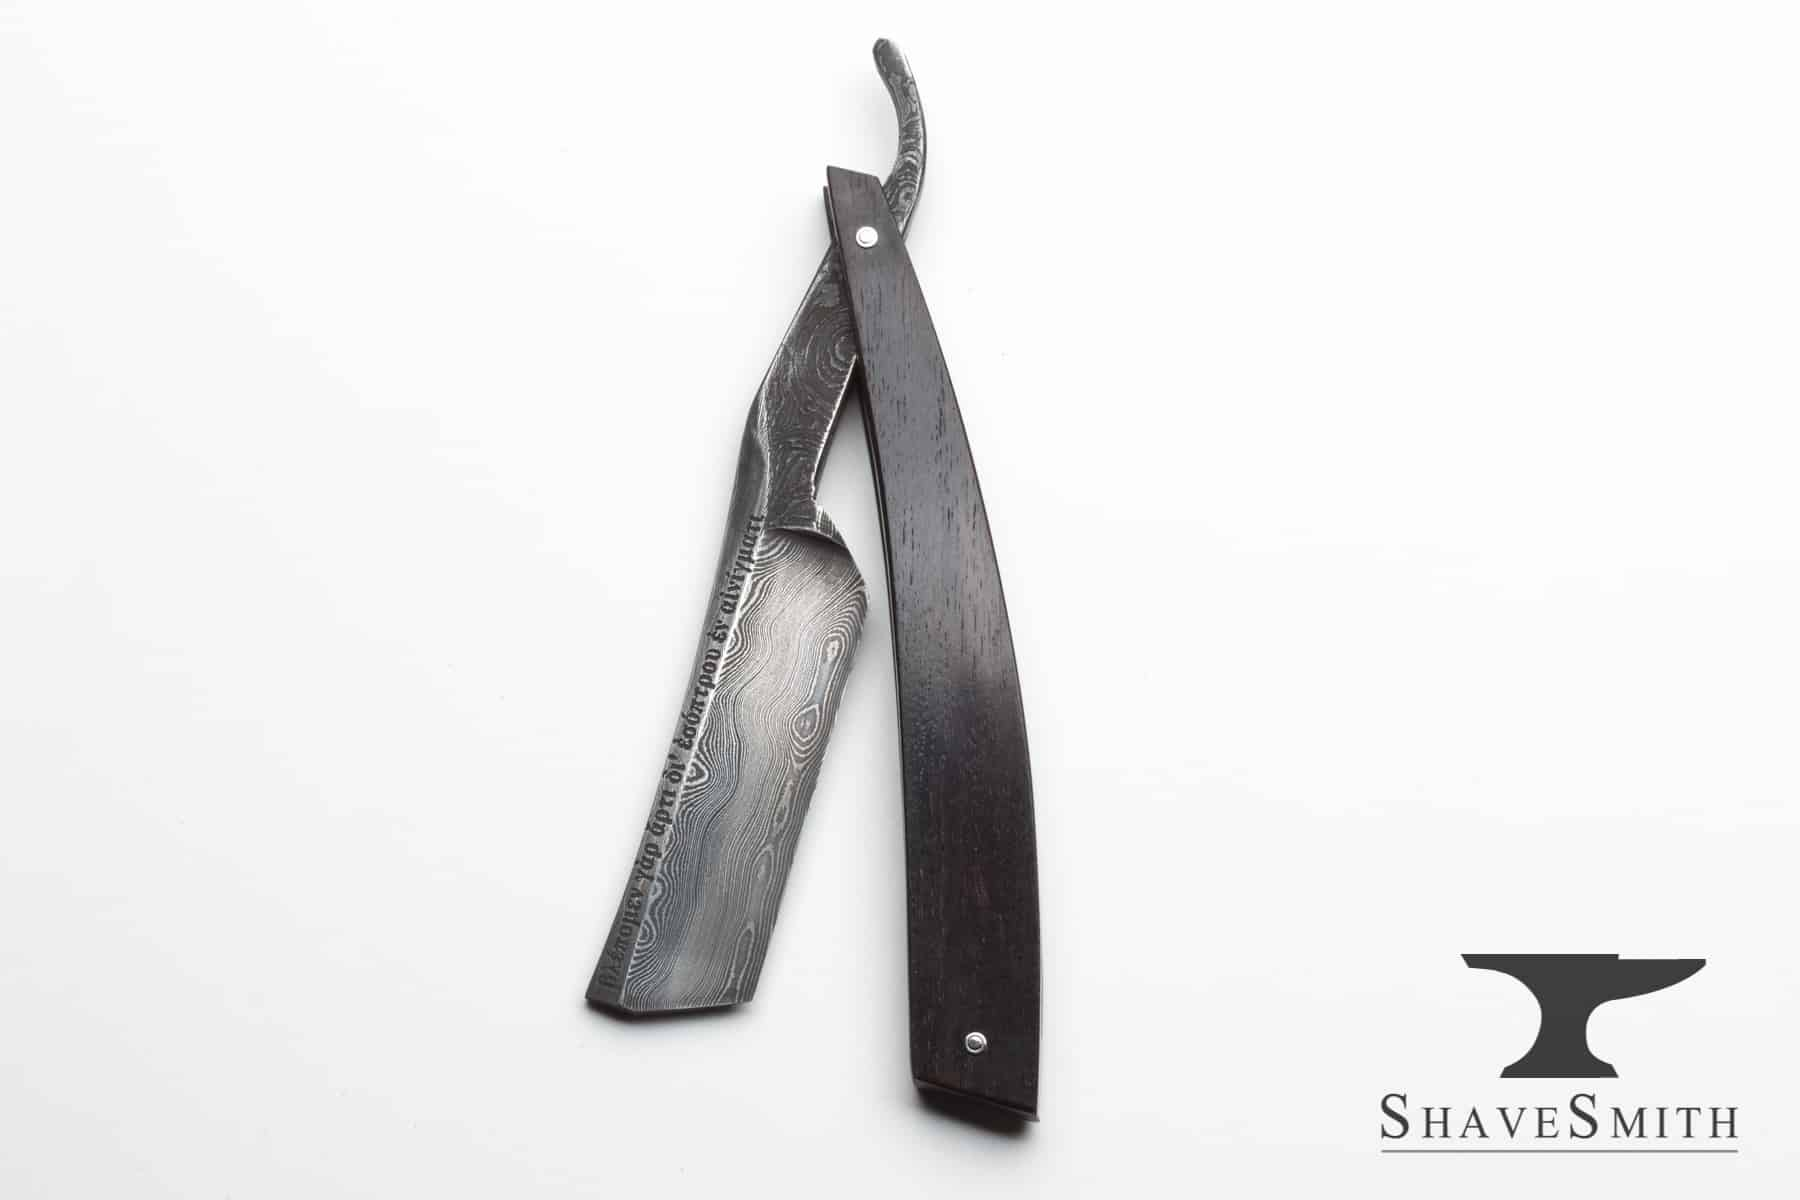 Agape - 7/8 Damascus, African Blackwood, Swayback, Tanto Custom Straight Razor